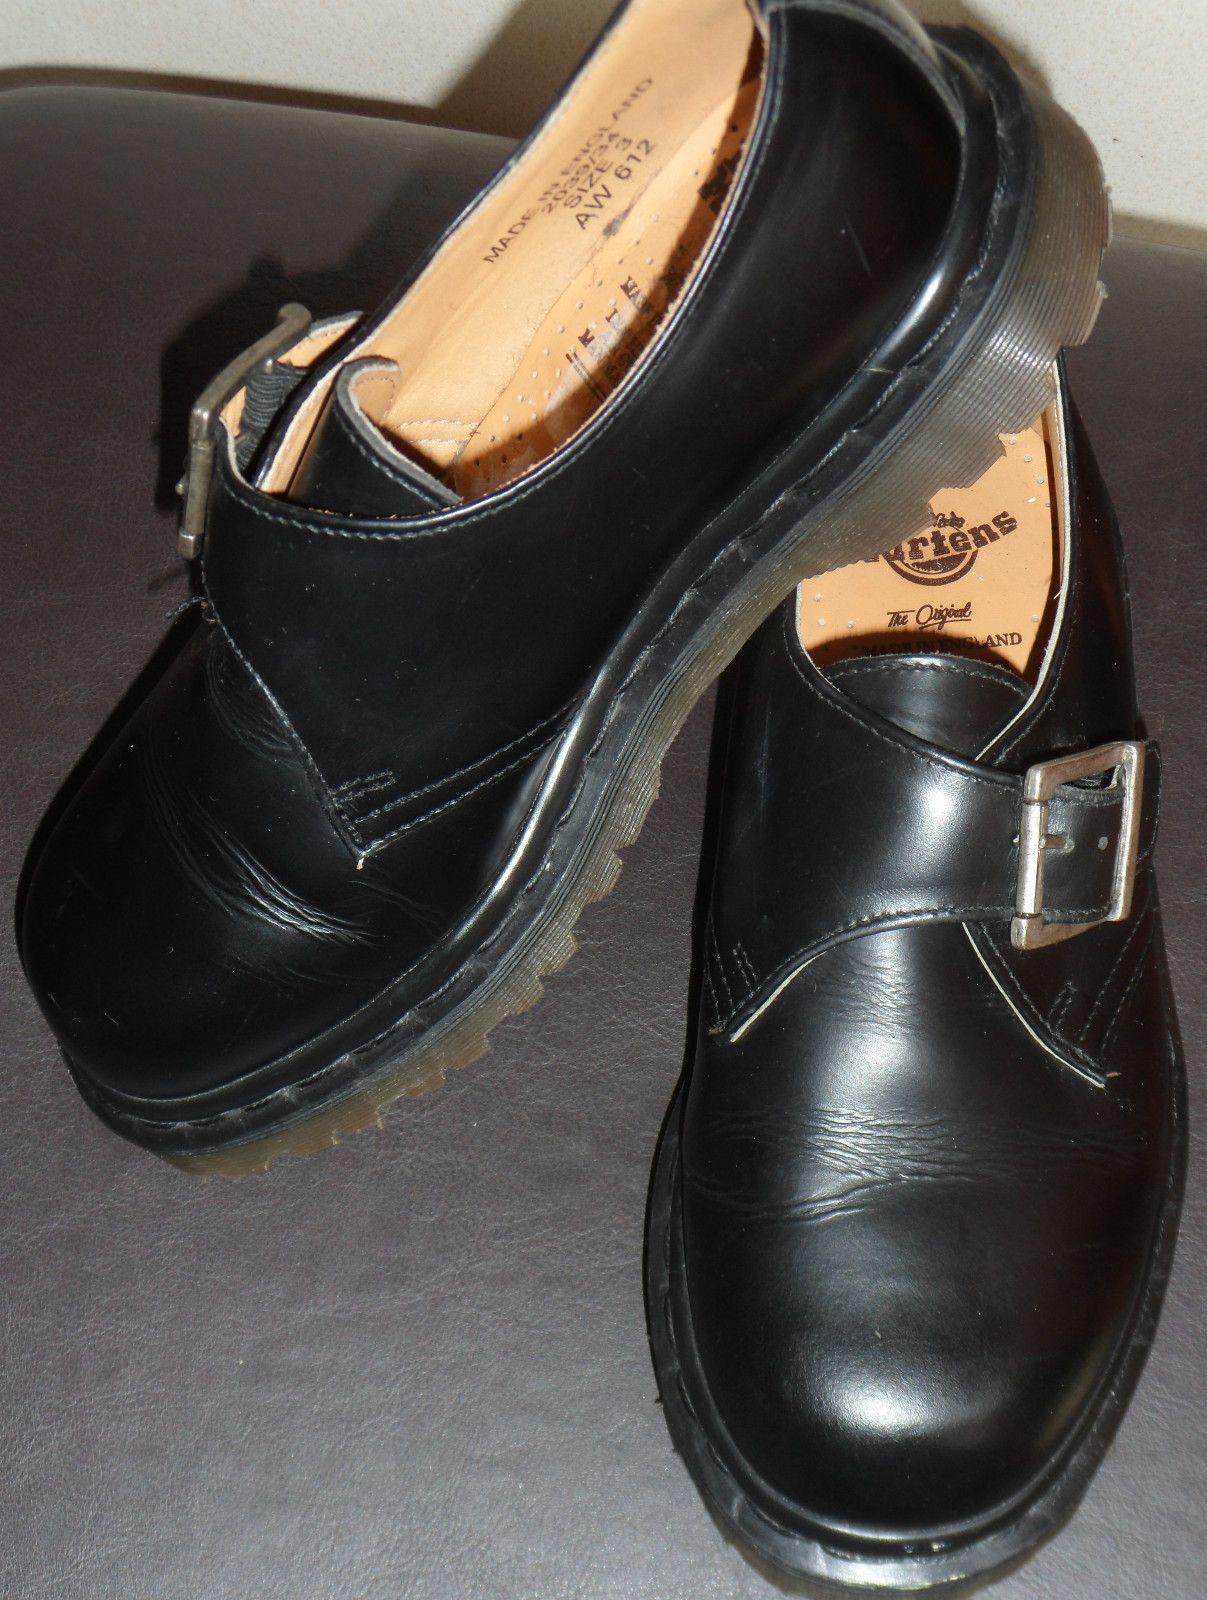 Dr Martens Womens Annah Chaussures Chaussures et Sacs Chaussures